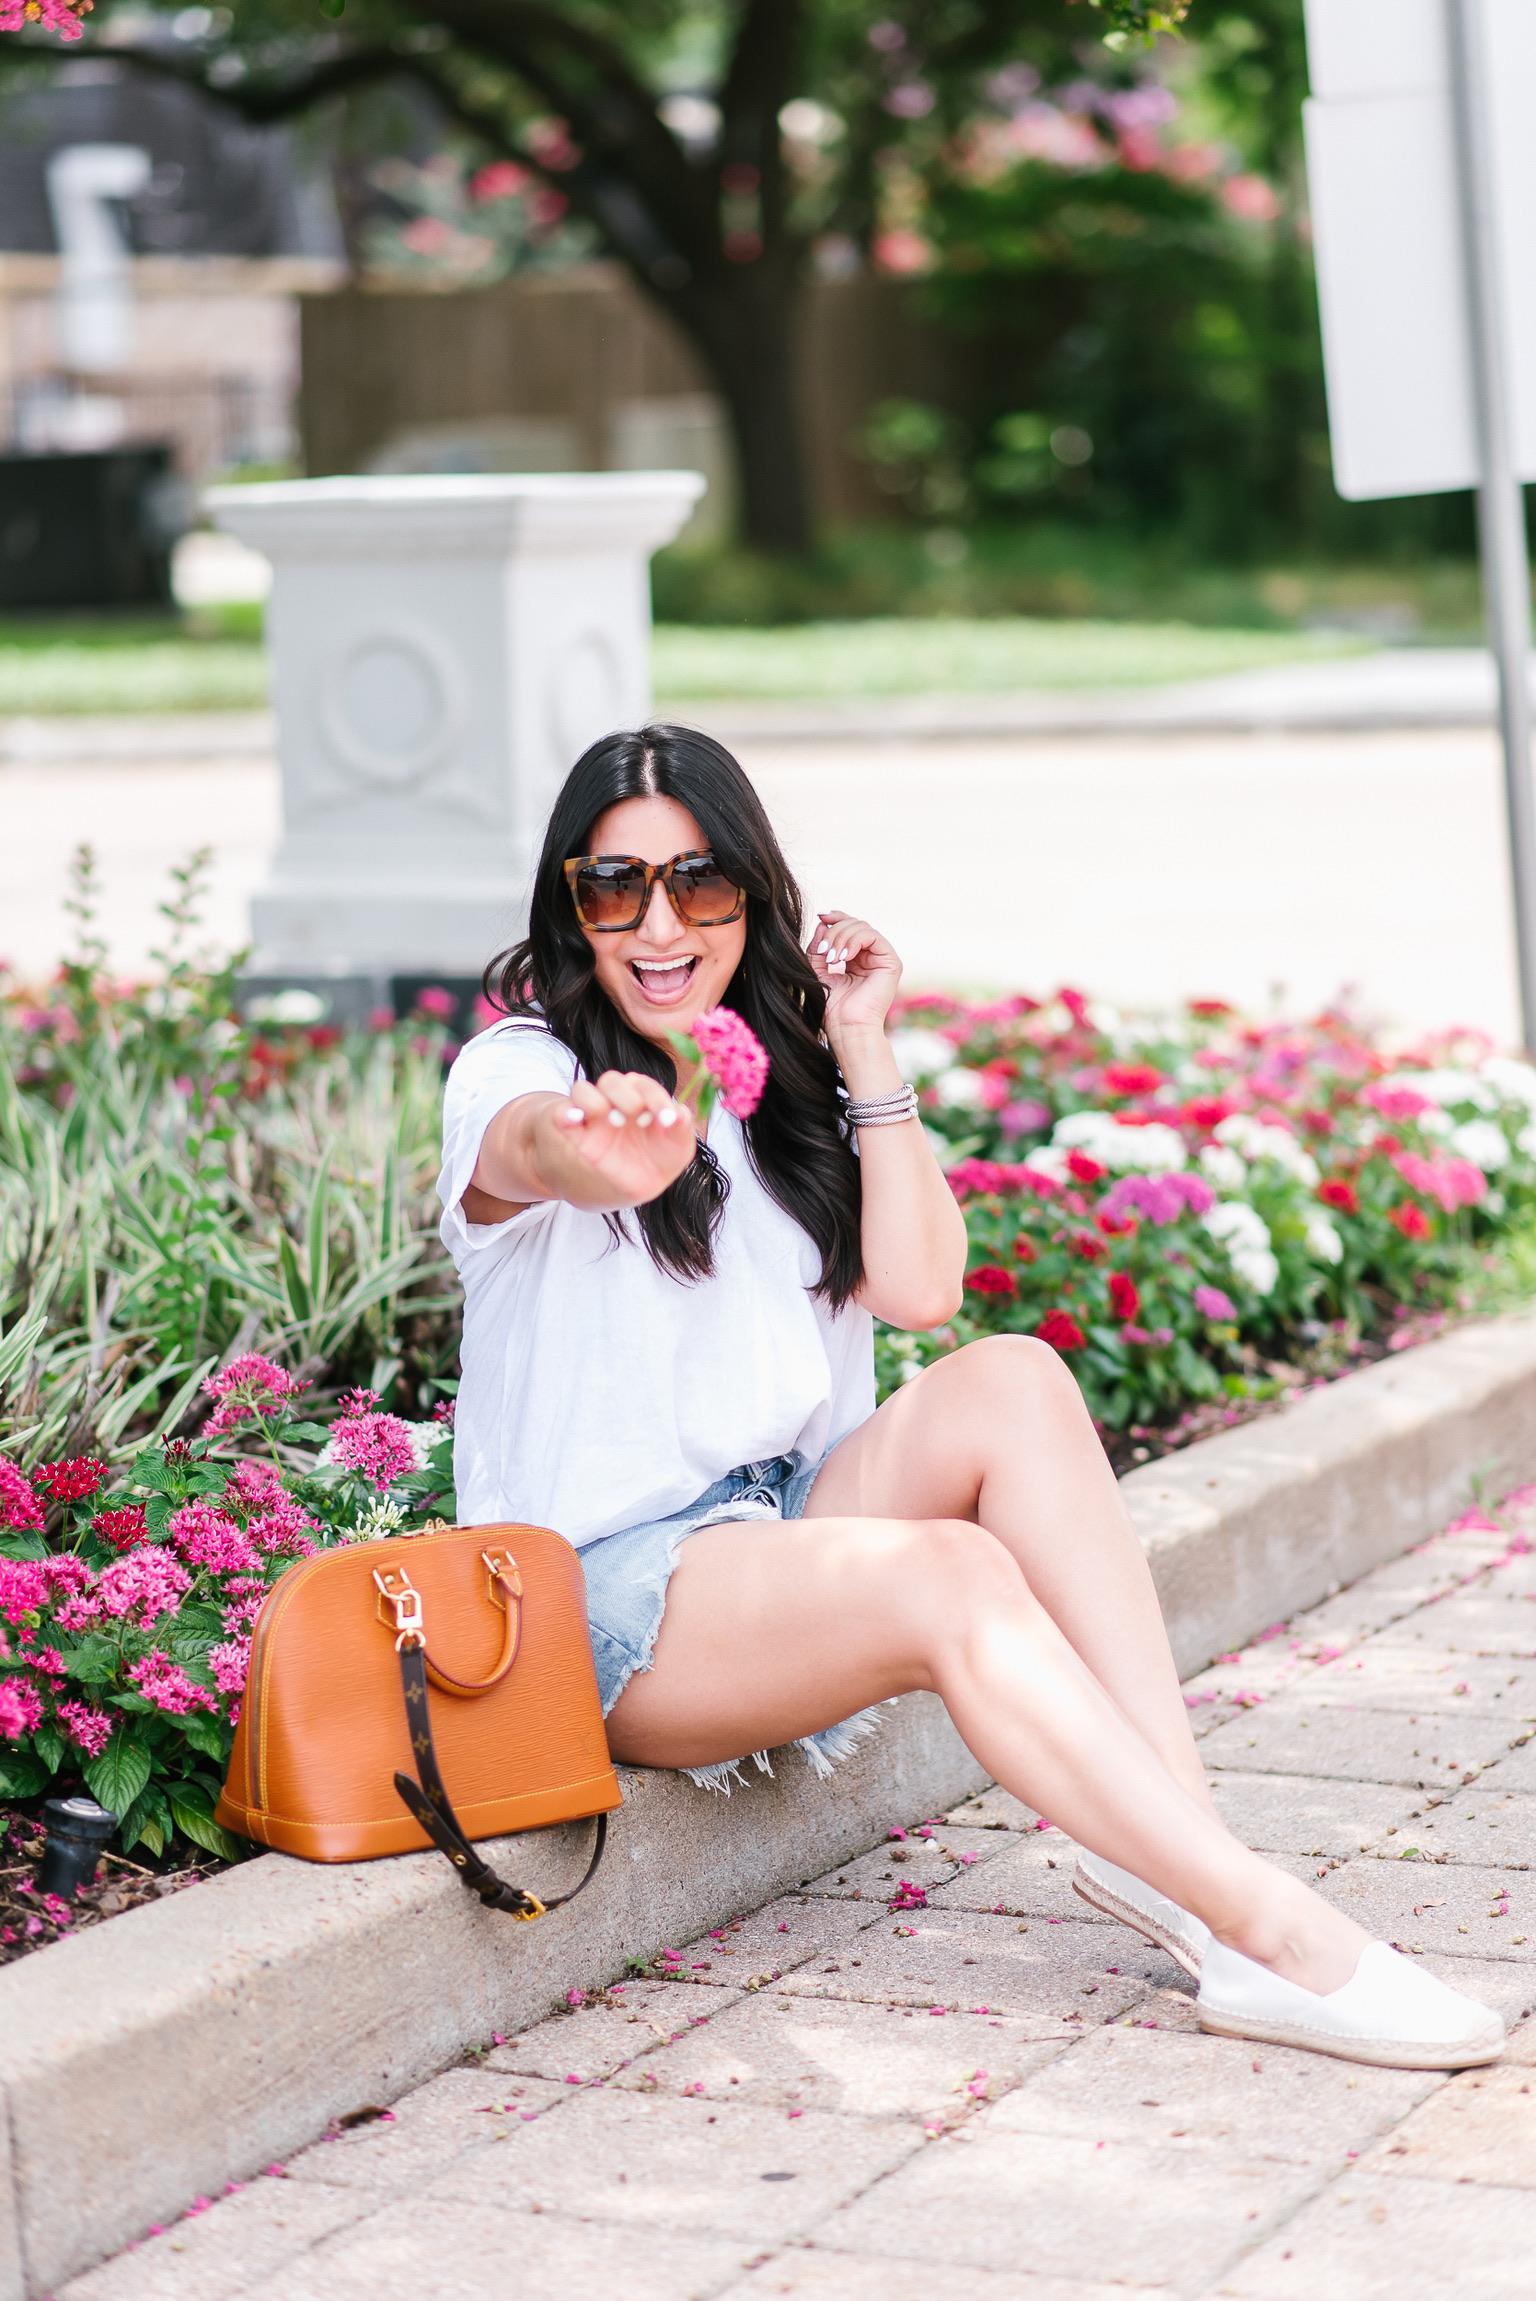 Houston lifestyle and fashion blogger LuxMommy sharing random facts